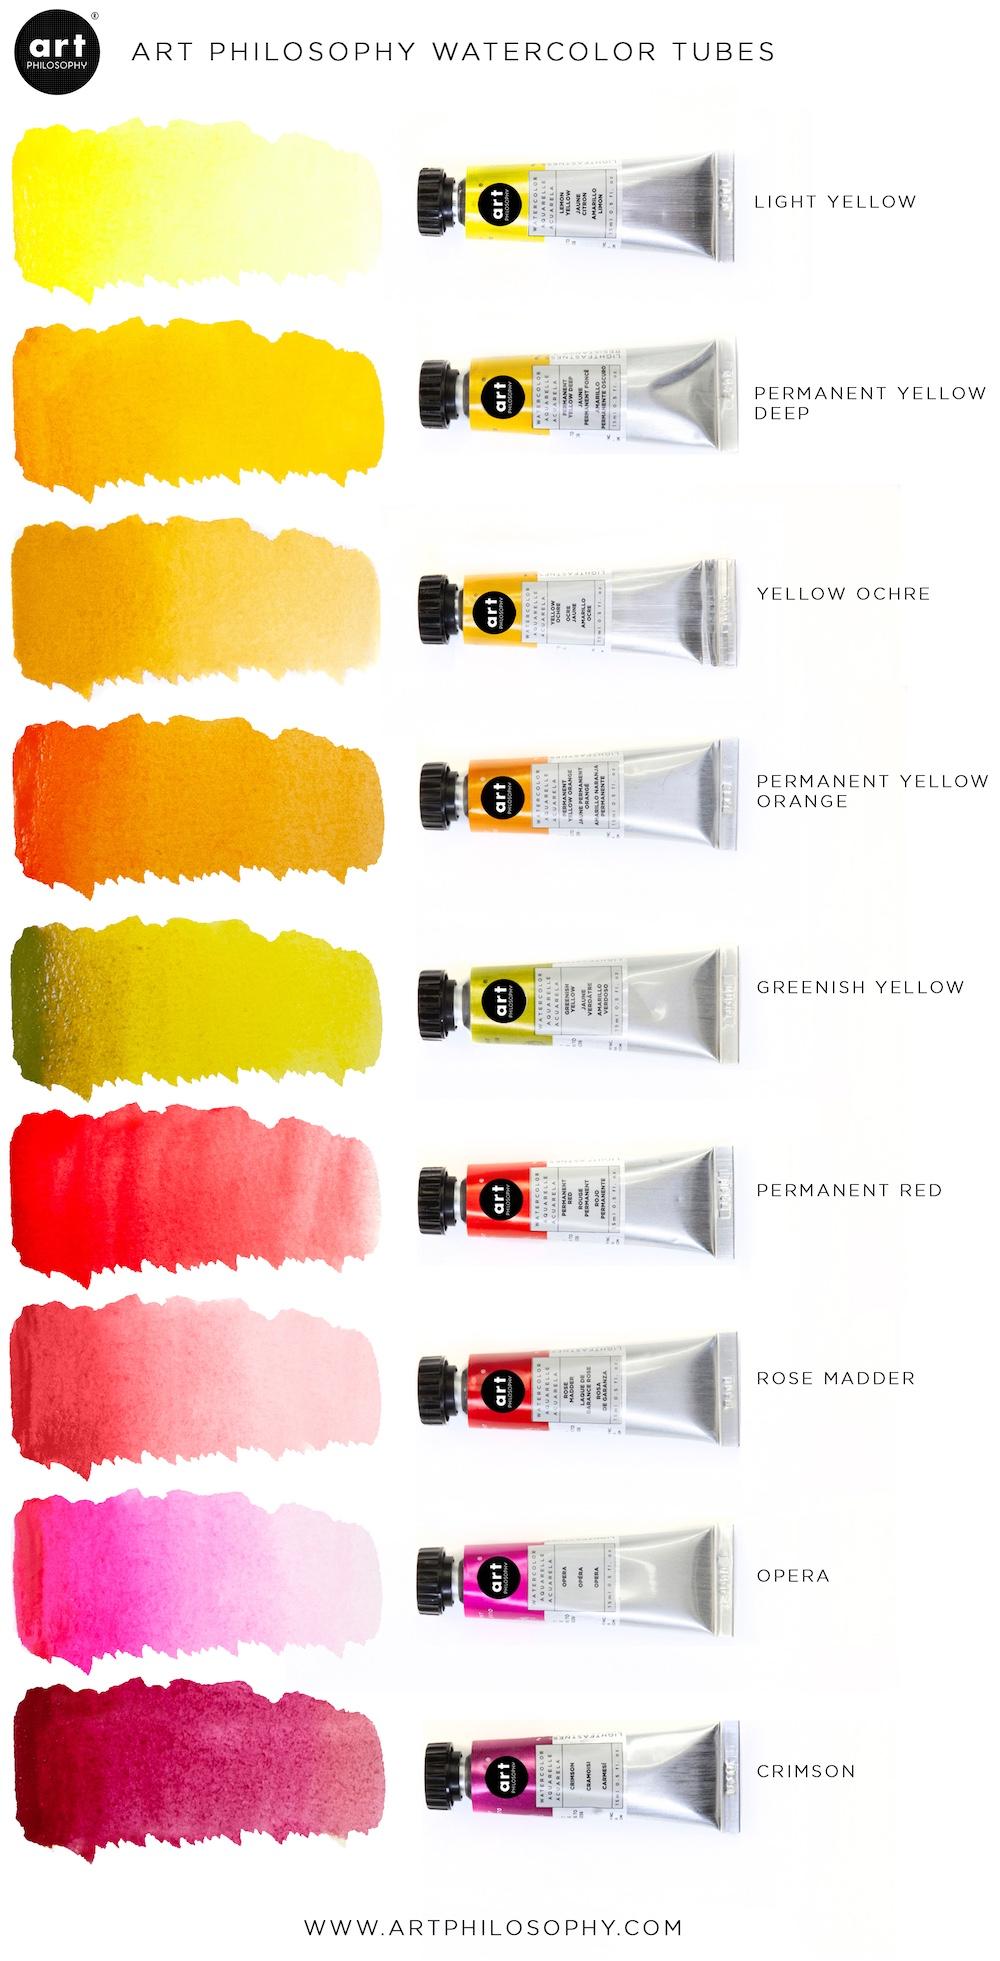 Art Philosophy® Artist Grade Watercolor Tubes - Permanent Brown